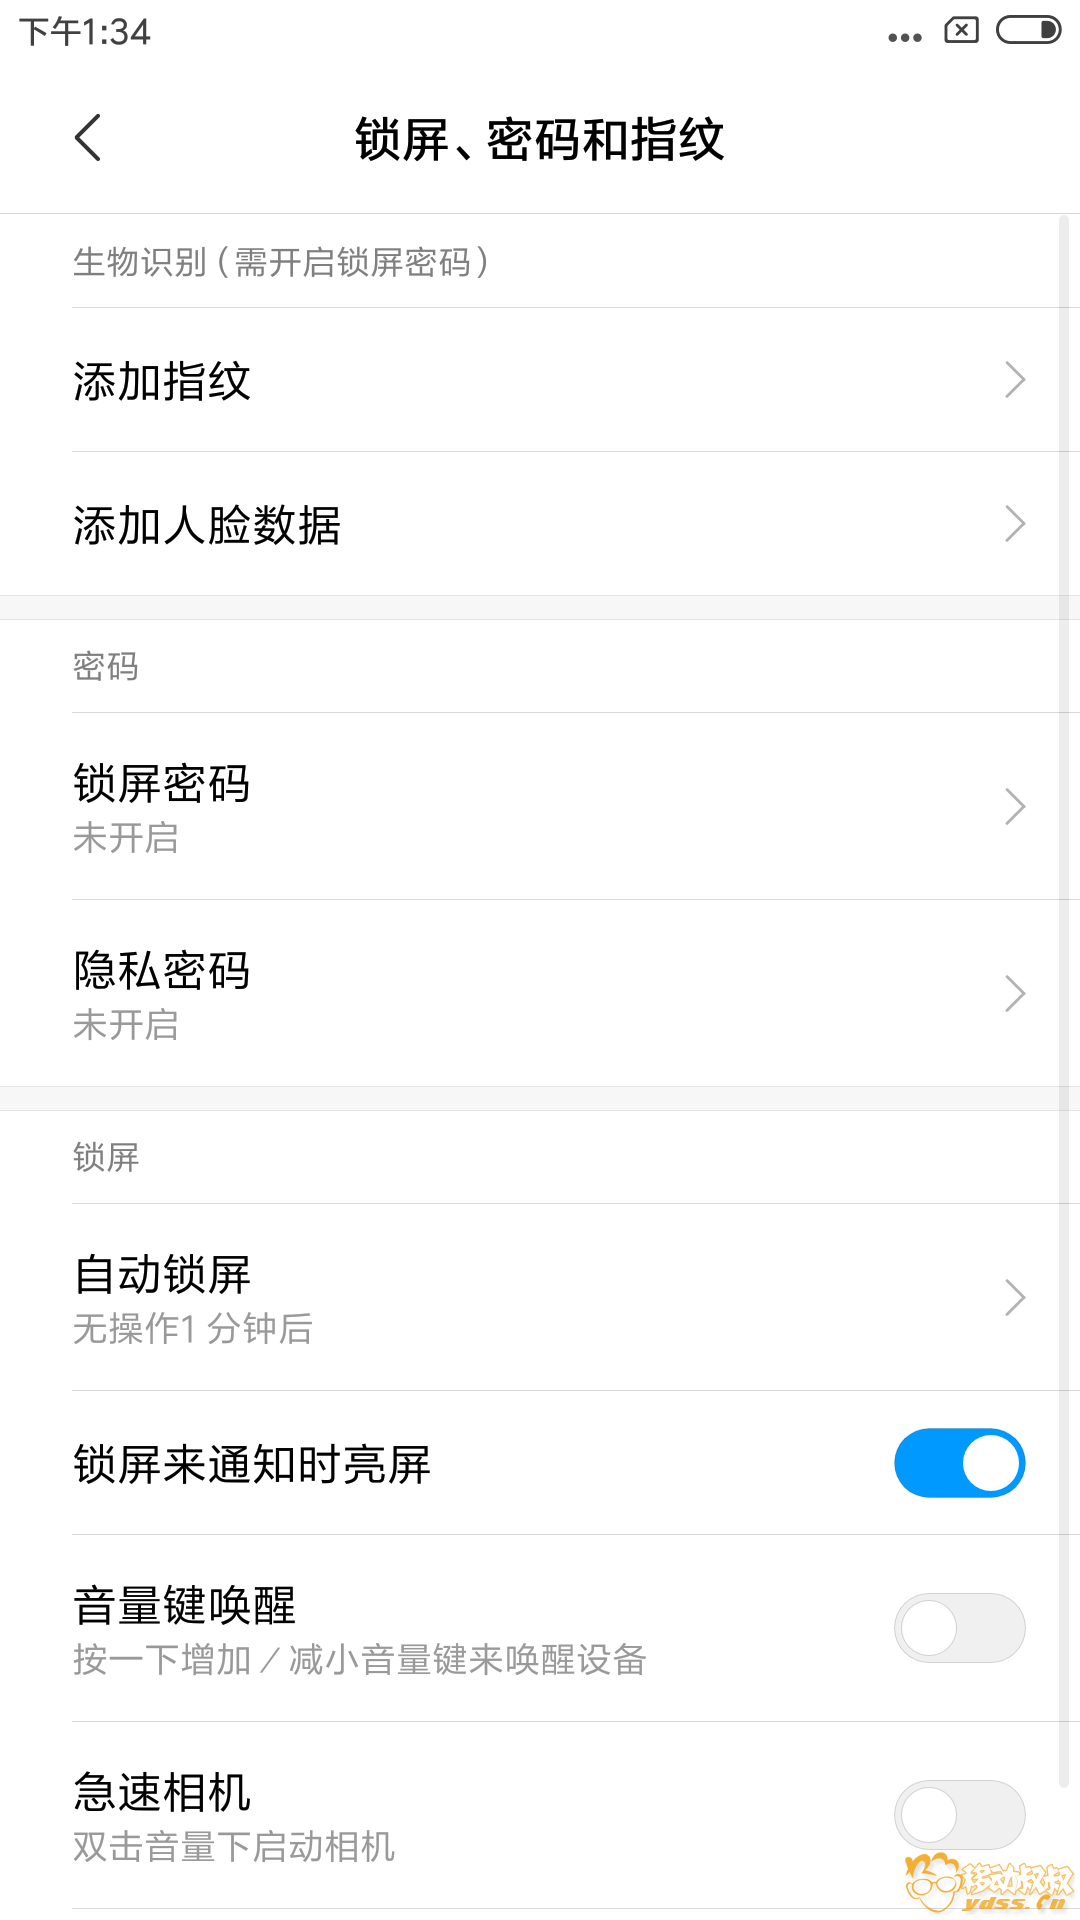 Screenshot_2018-06-14-13-34-50-235_com.android.settings.png